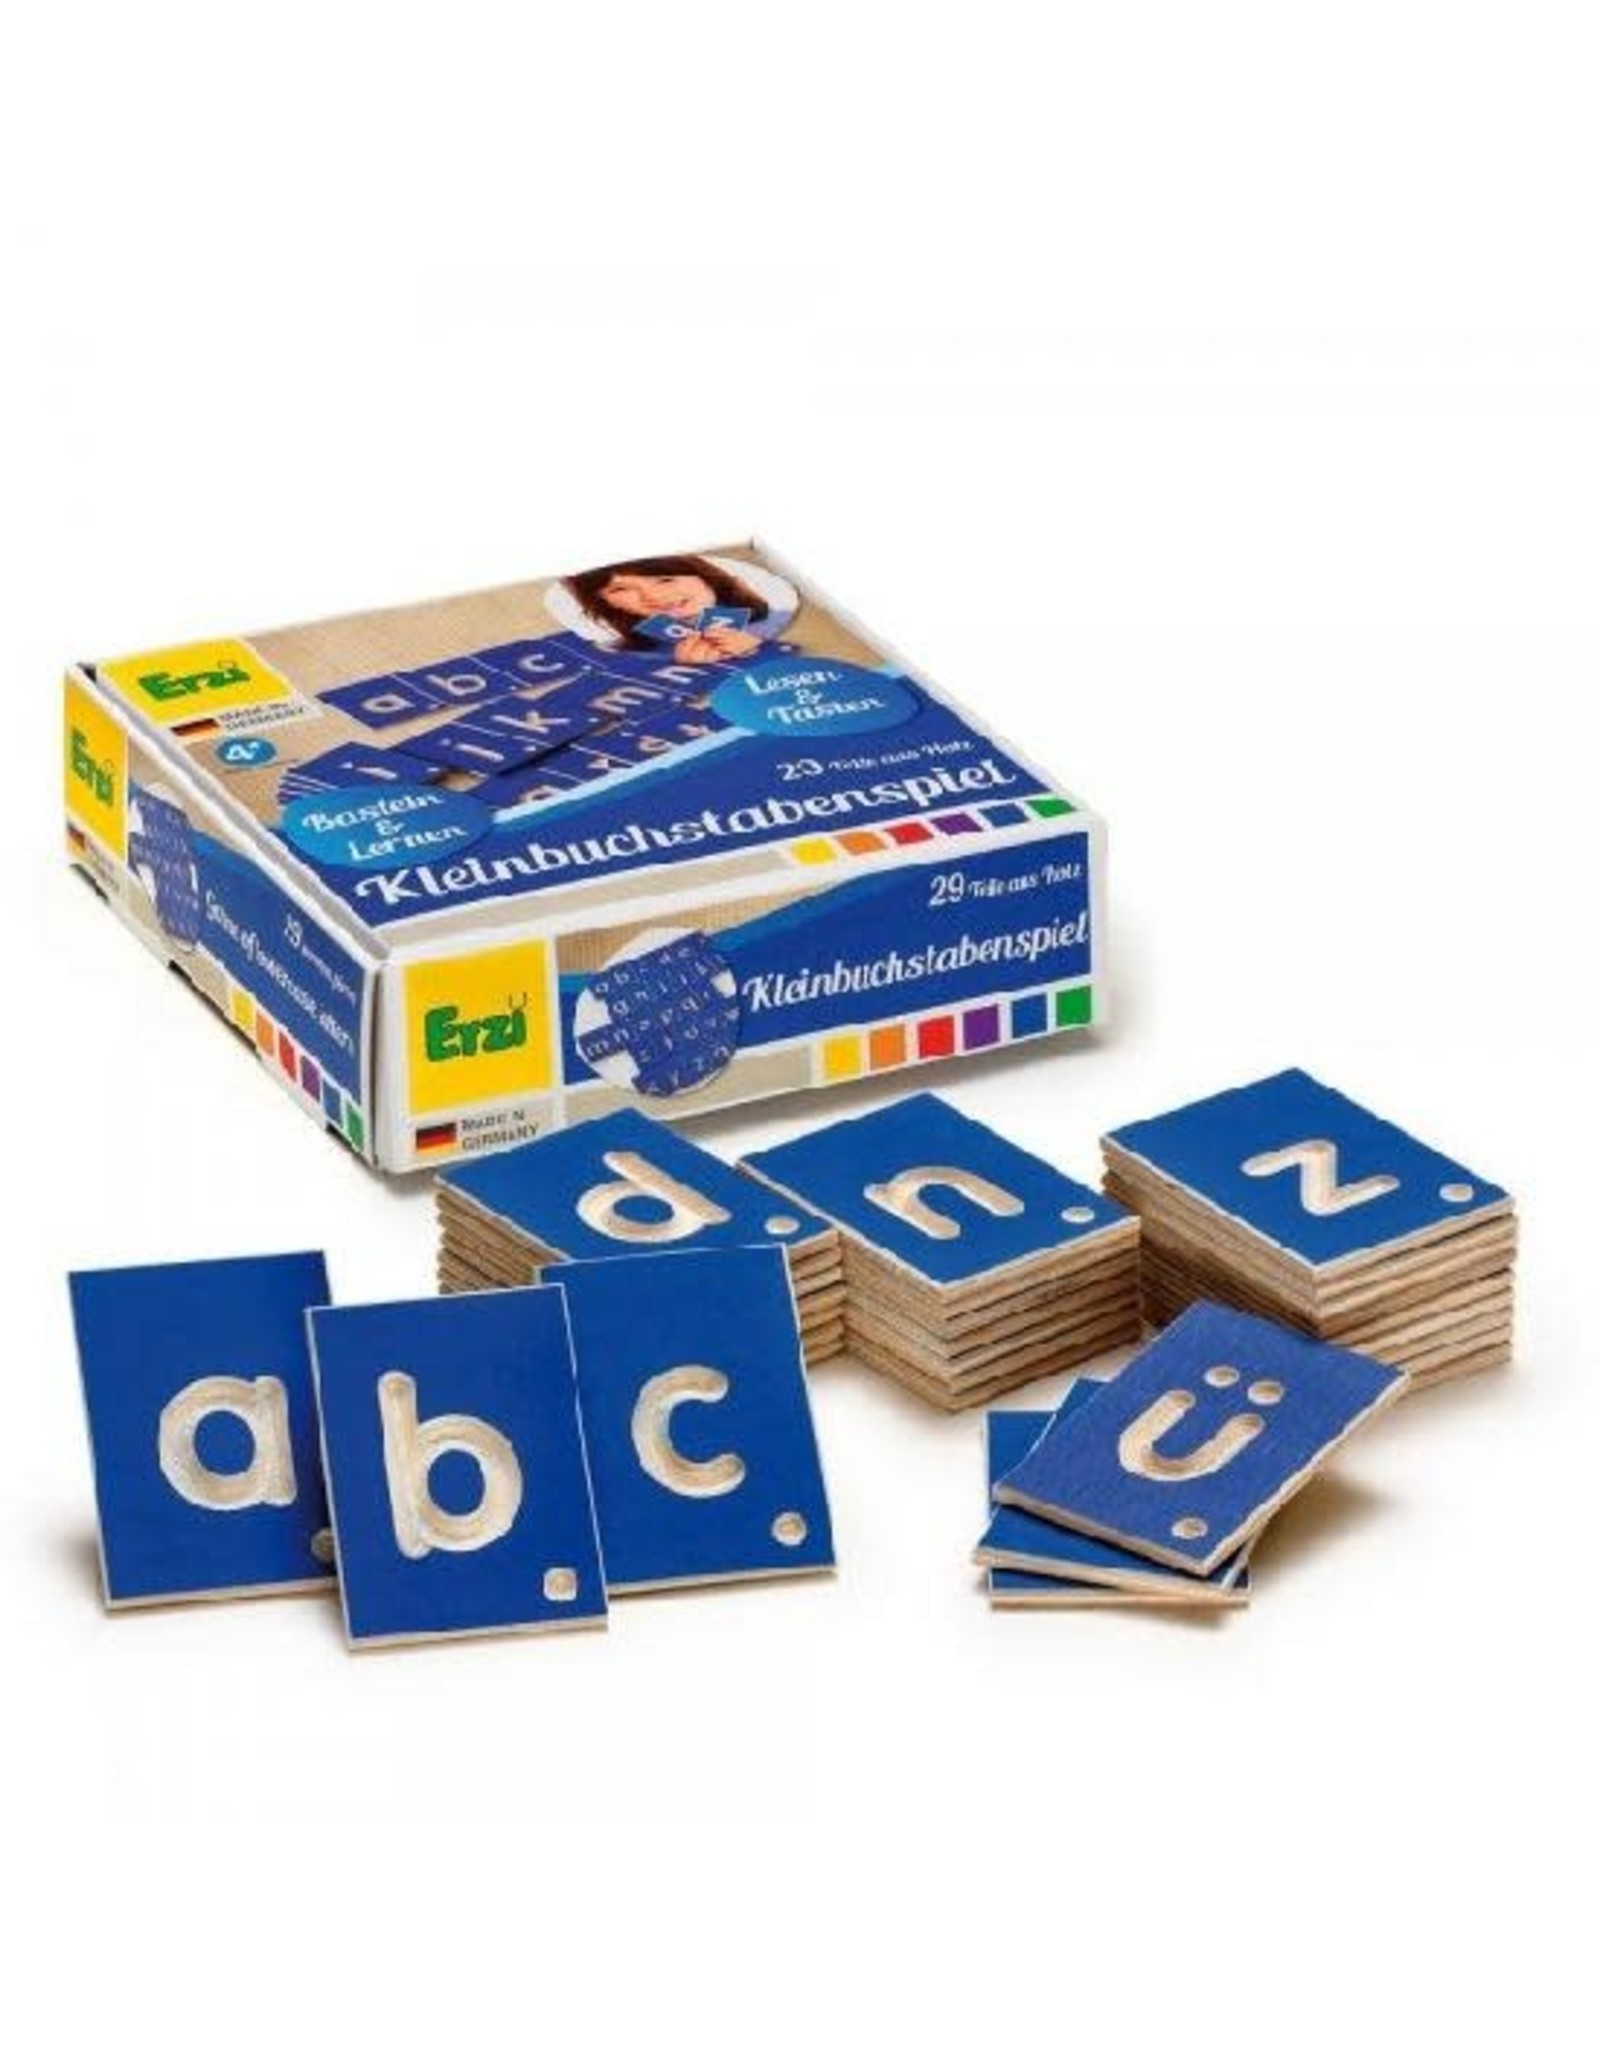 Erzi Educational Game Lowercase Letters